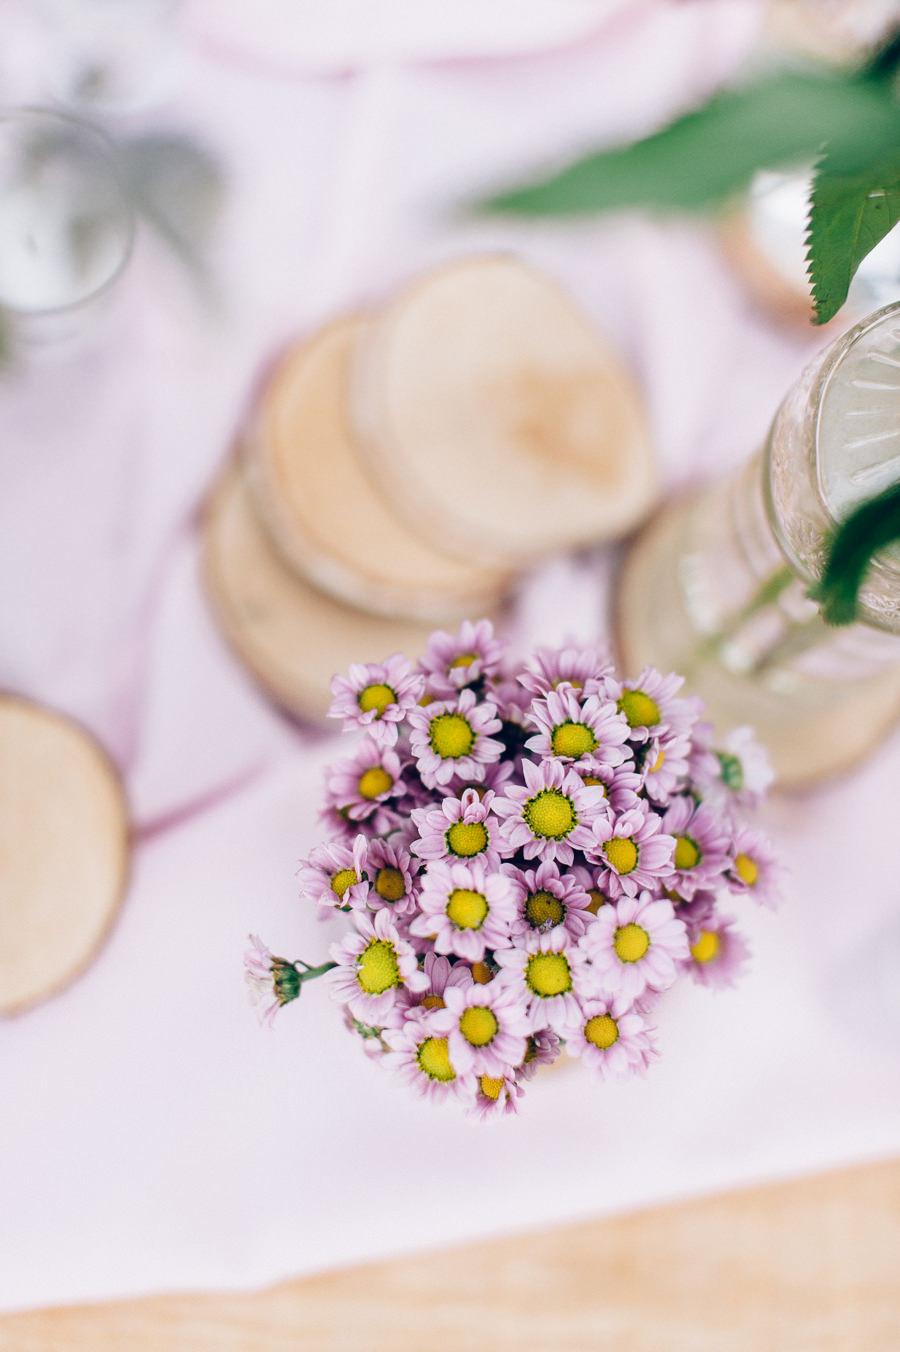 Flores para decorar tipis chill out 10